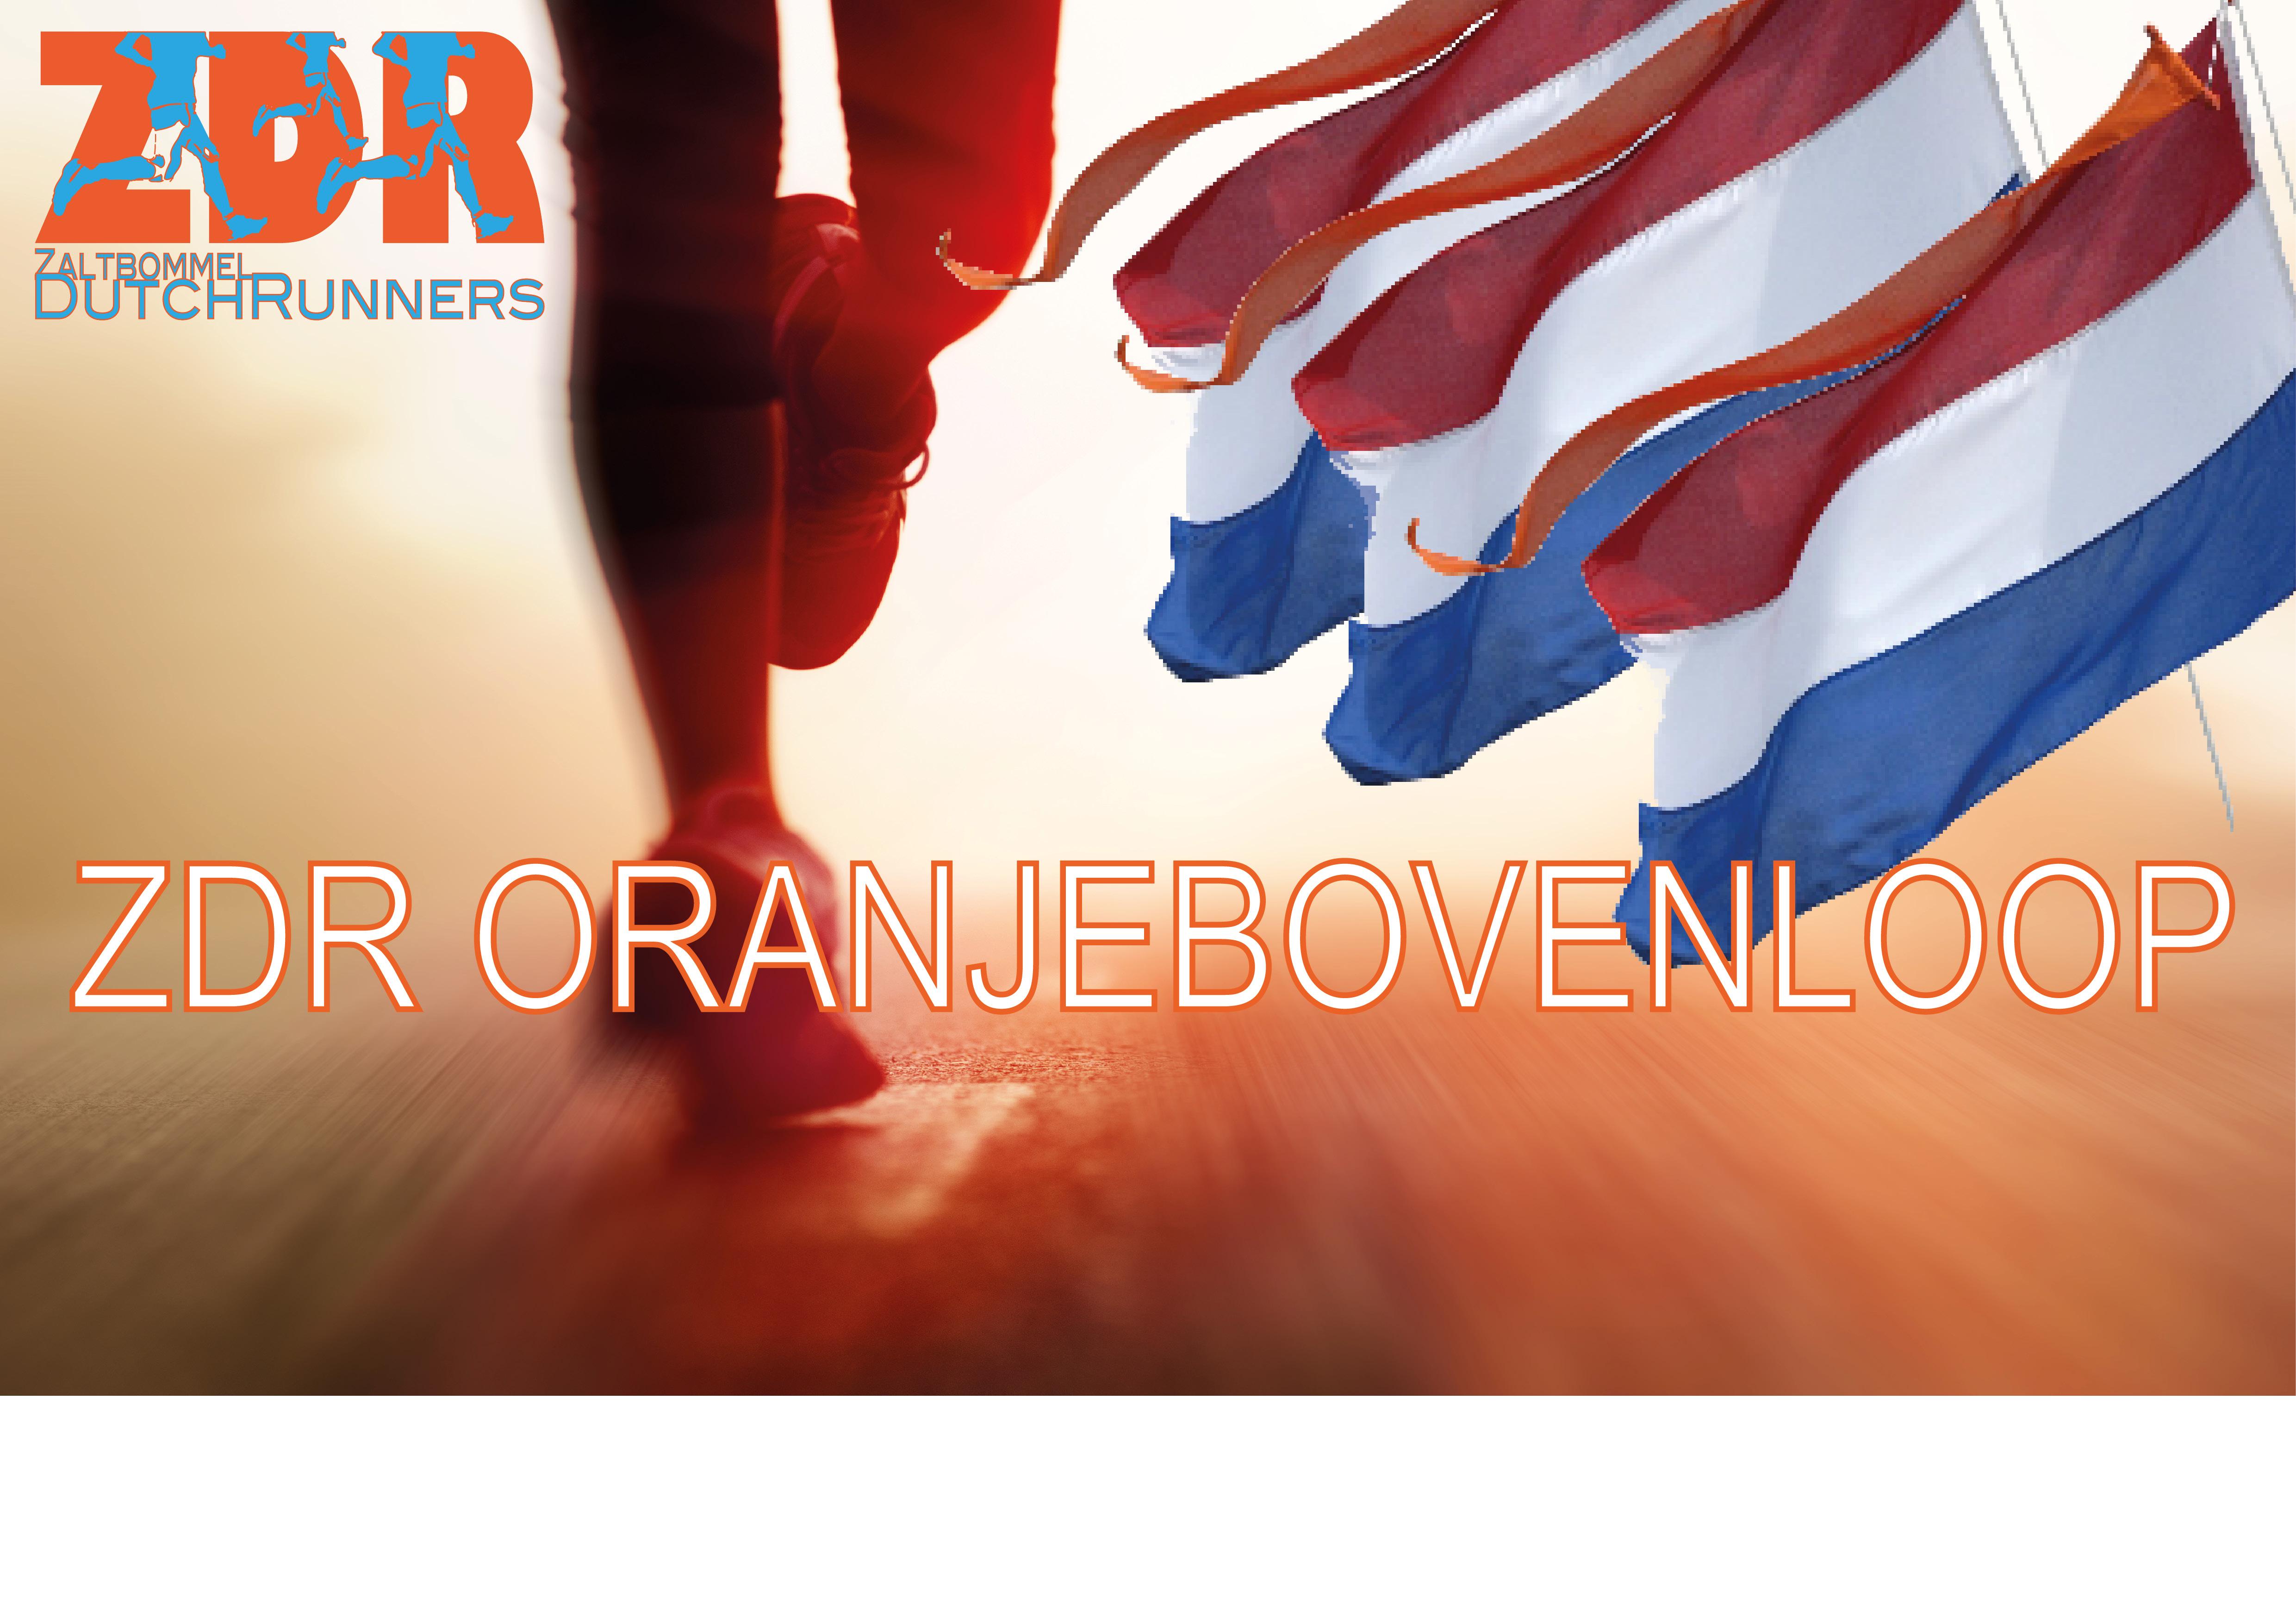 hardlopen op koningsdag in Zaltbommel